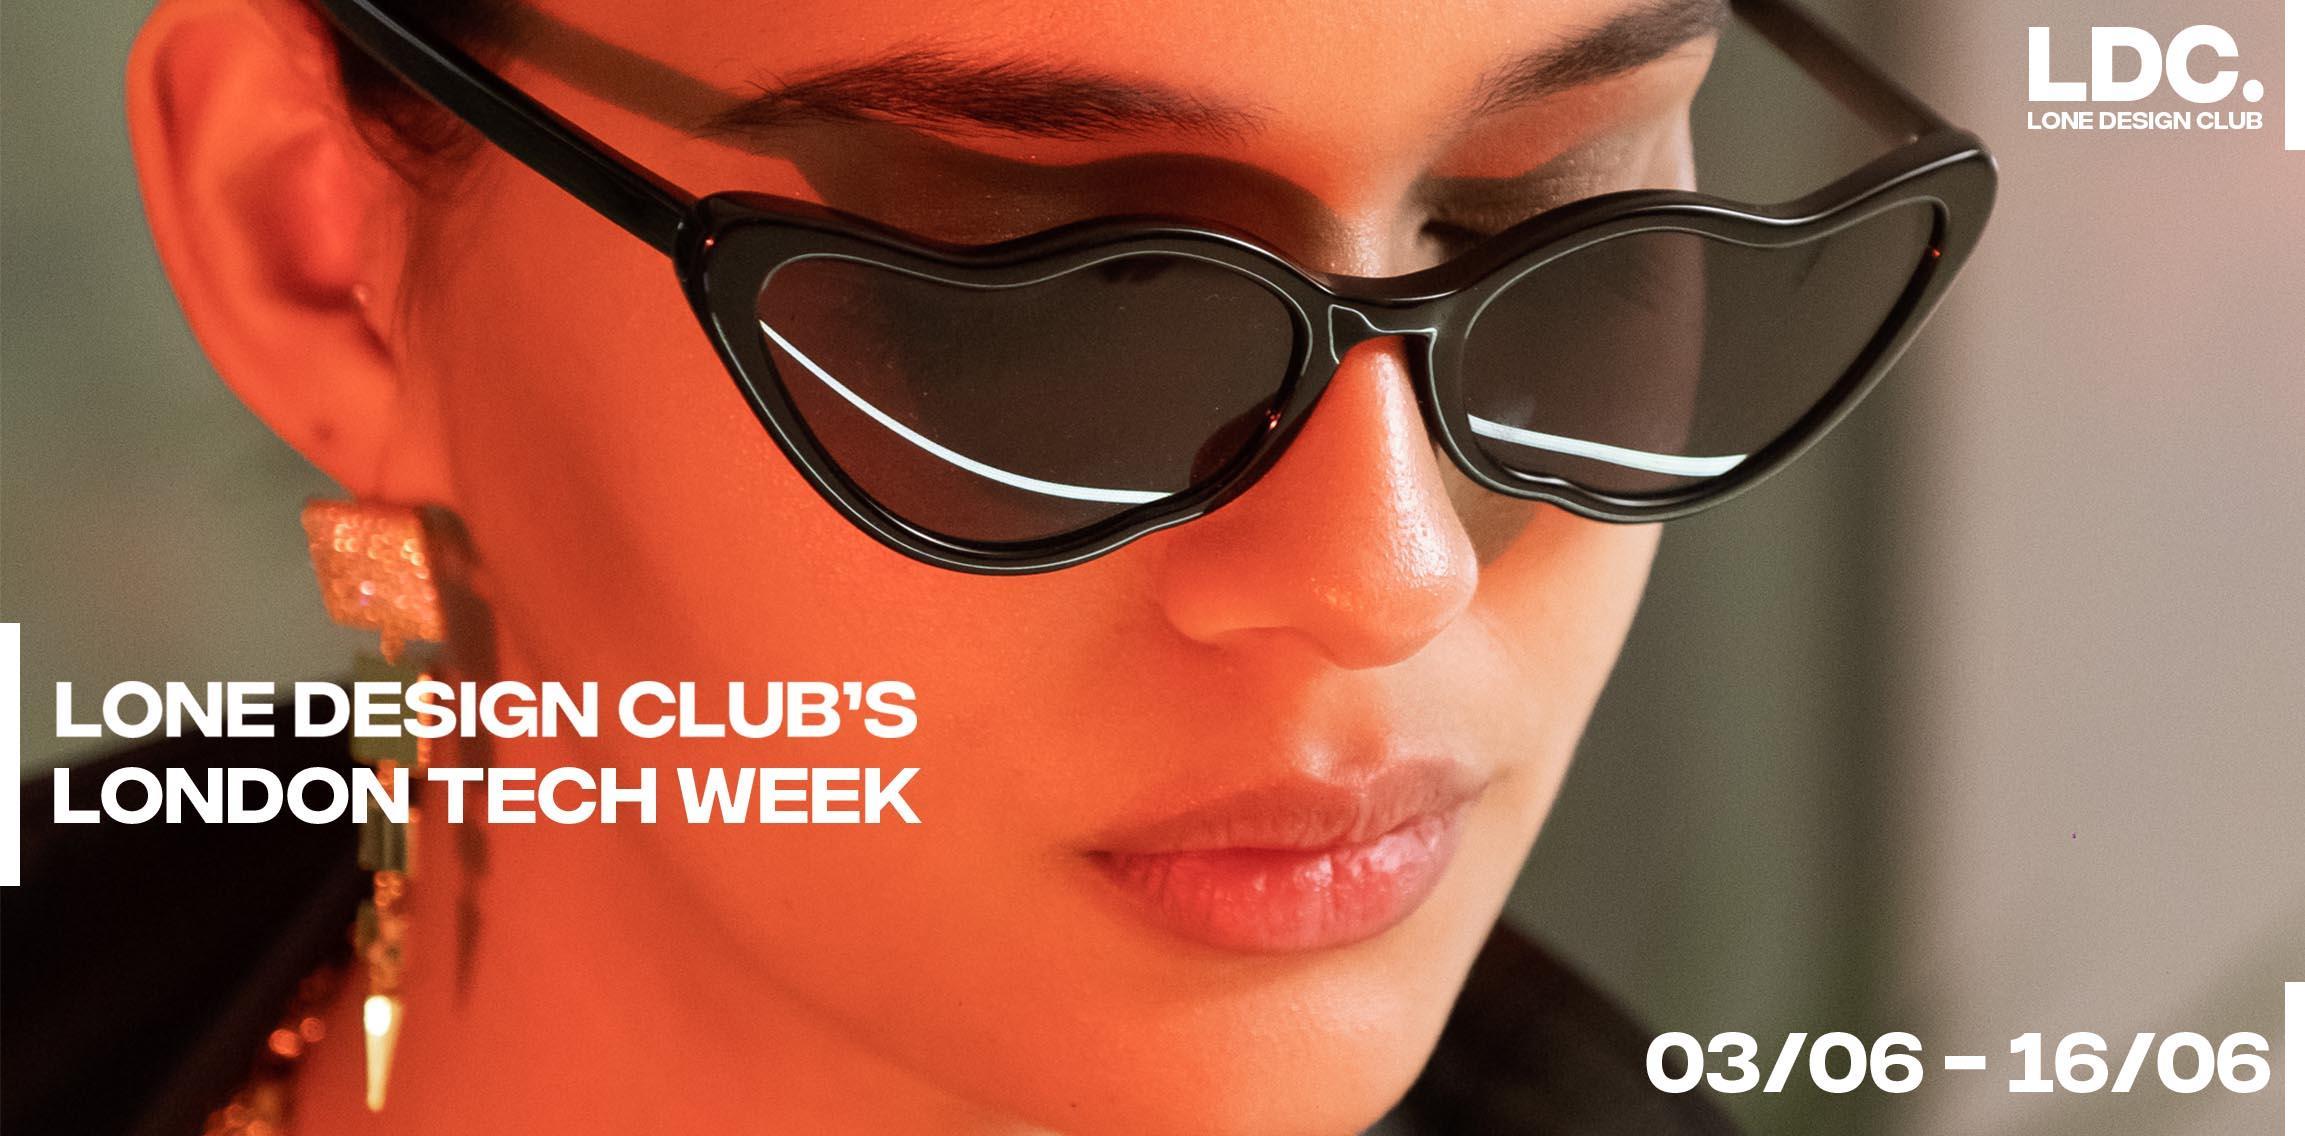 Lone Design Club's London Tech Week: Experiences + Concept Store